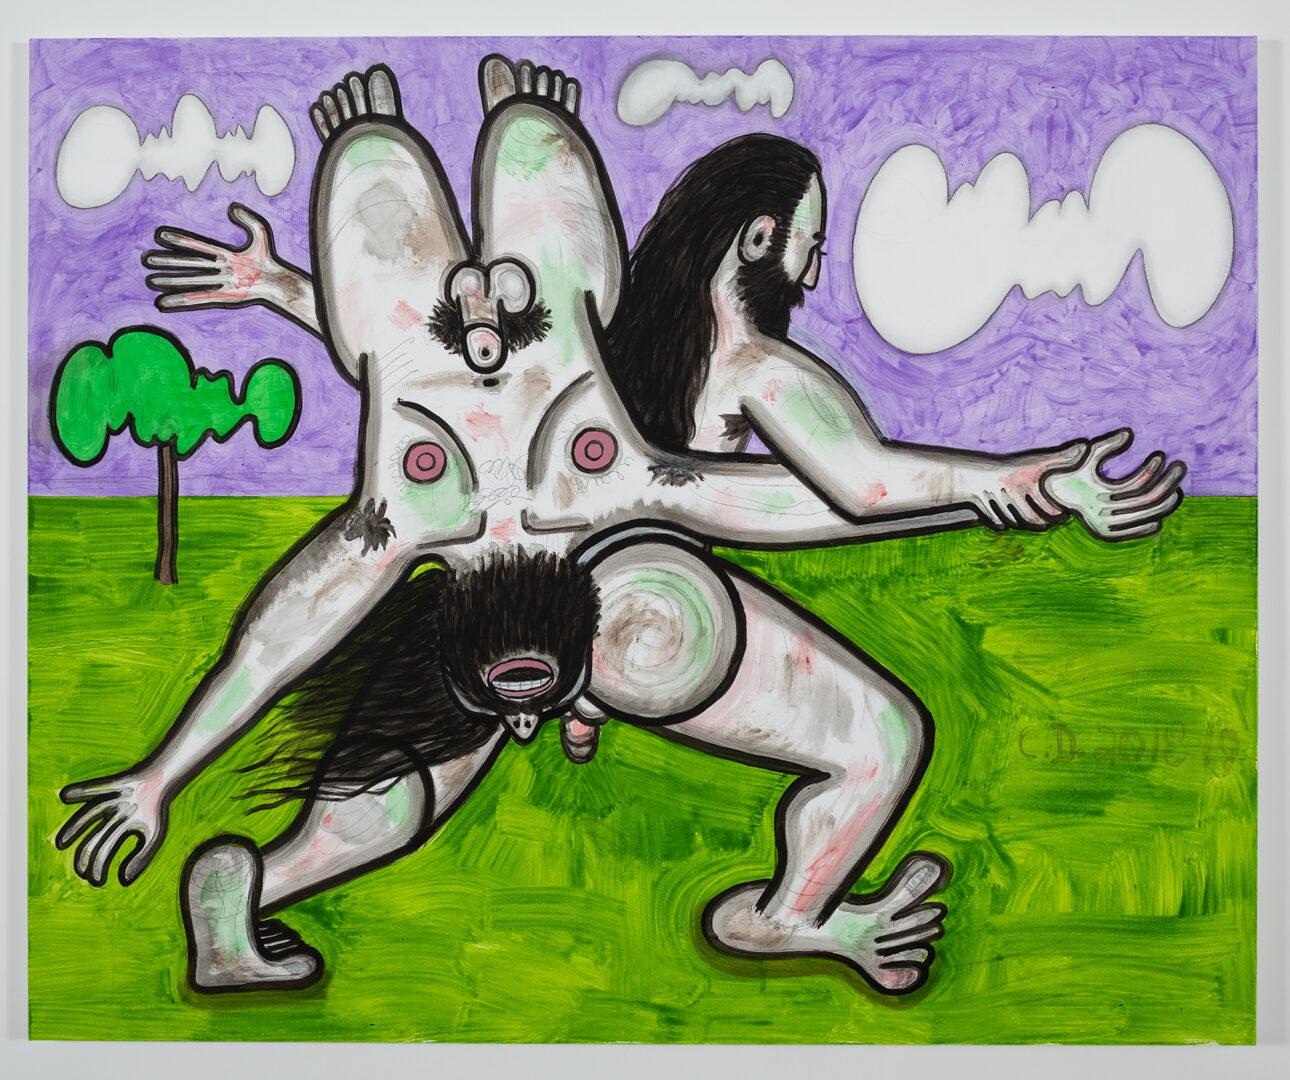 Exhibition View Carroll Dunham Soloshow «Recent Paintings; view on Clouds (2), 2018-19» at Galerie Eva Presenhuber, Zurich, 2019 / Photo: Stefan Altenburger / © Carroll Dunham / Courtesy the artist and Galerie Eva Presenhuber, Zurich / New York